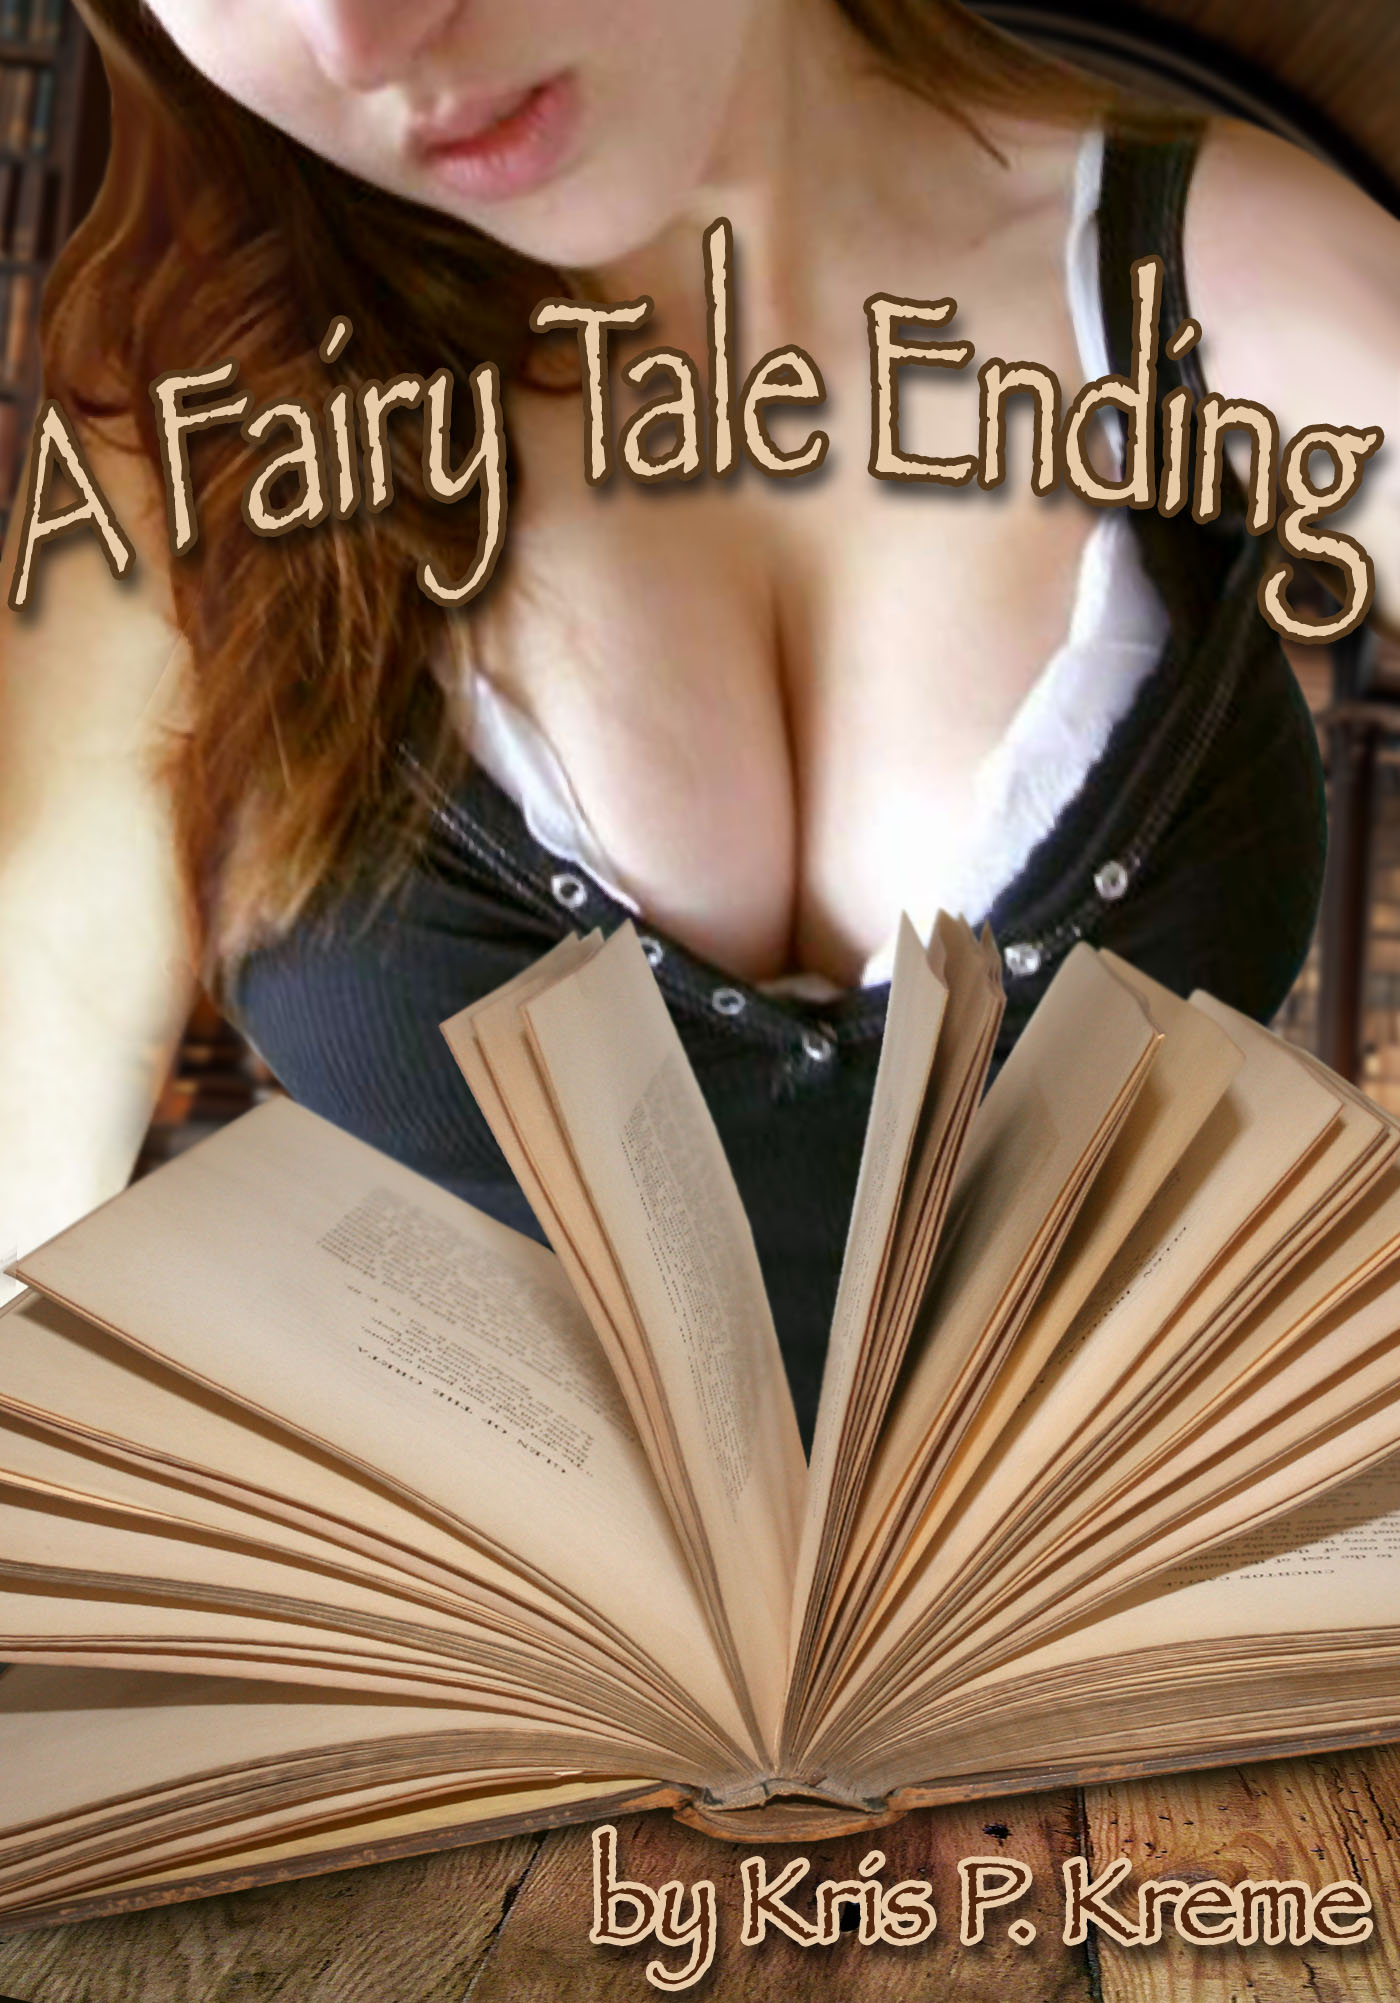 A Fairy Tale Ending by Kris P. Kreme